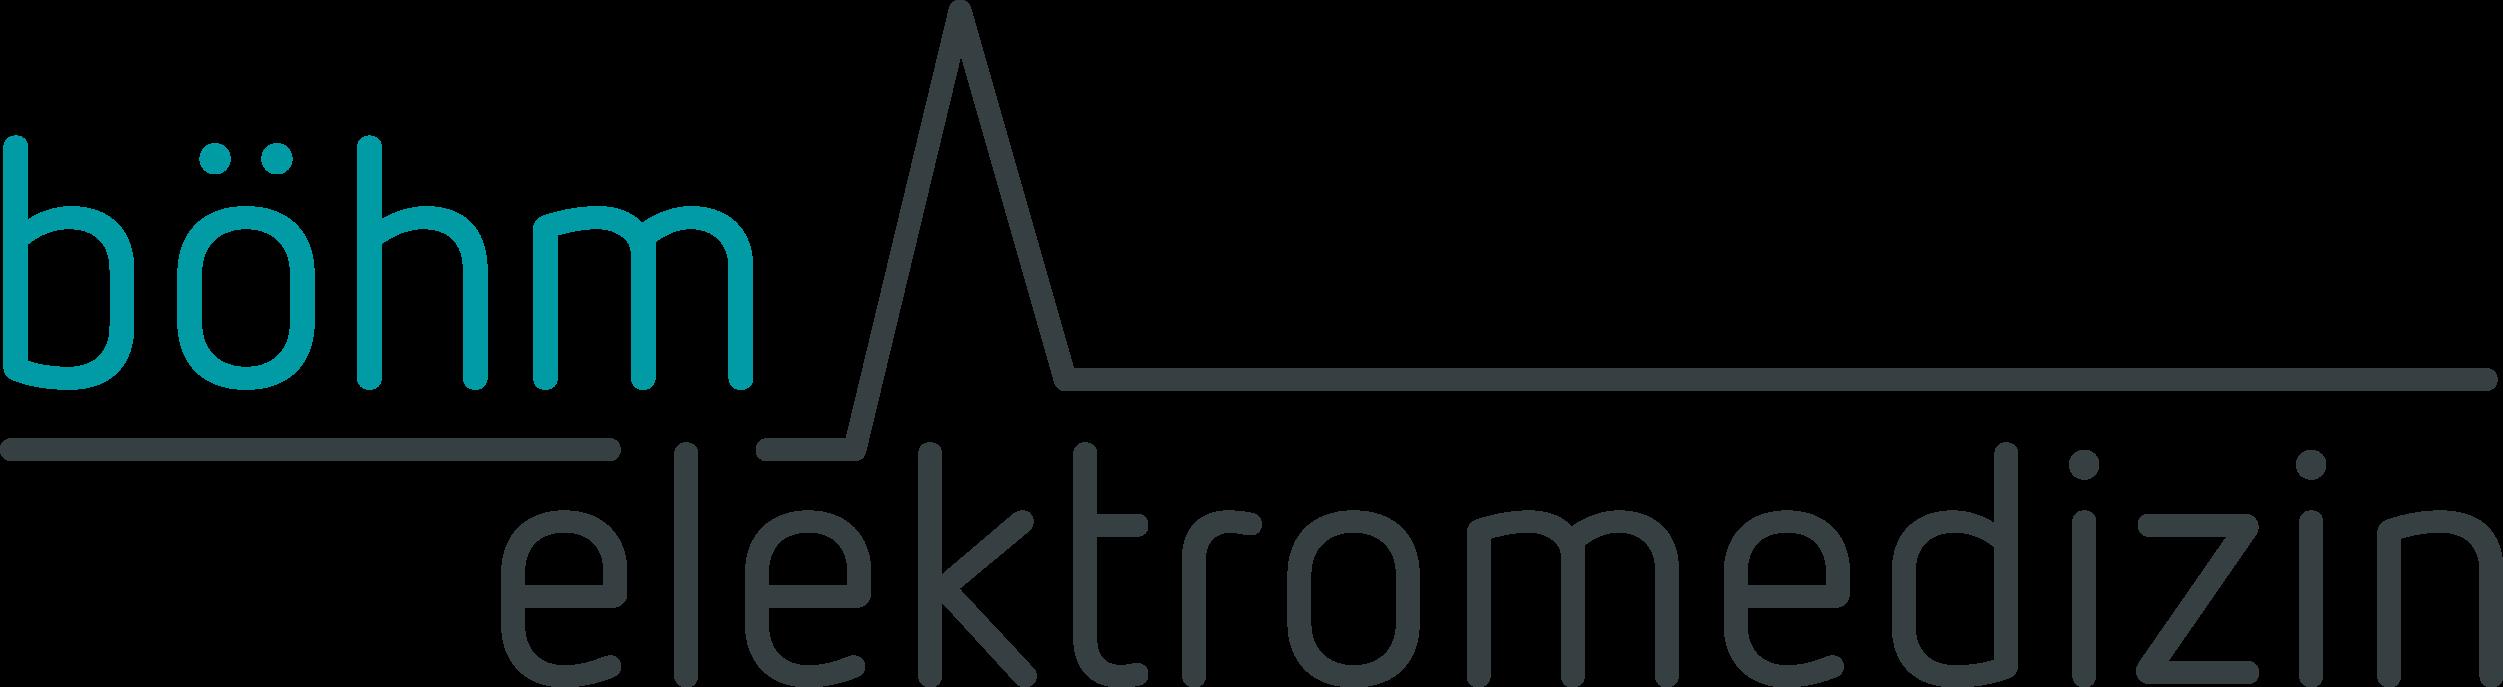 Böhm Elektromedizin GmbH